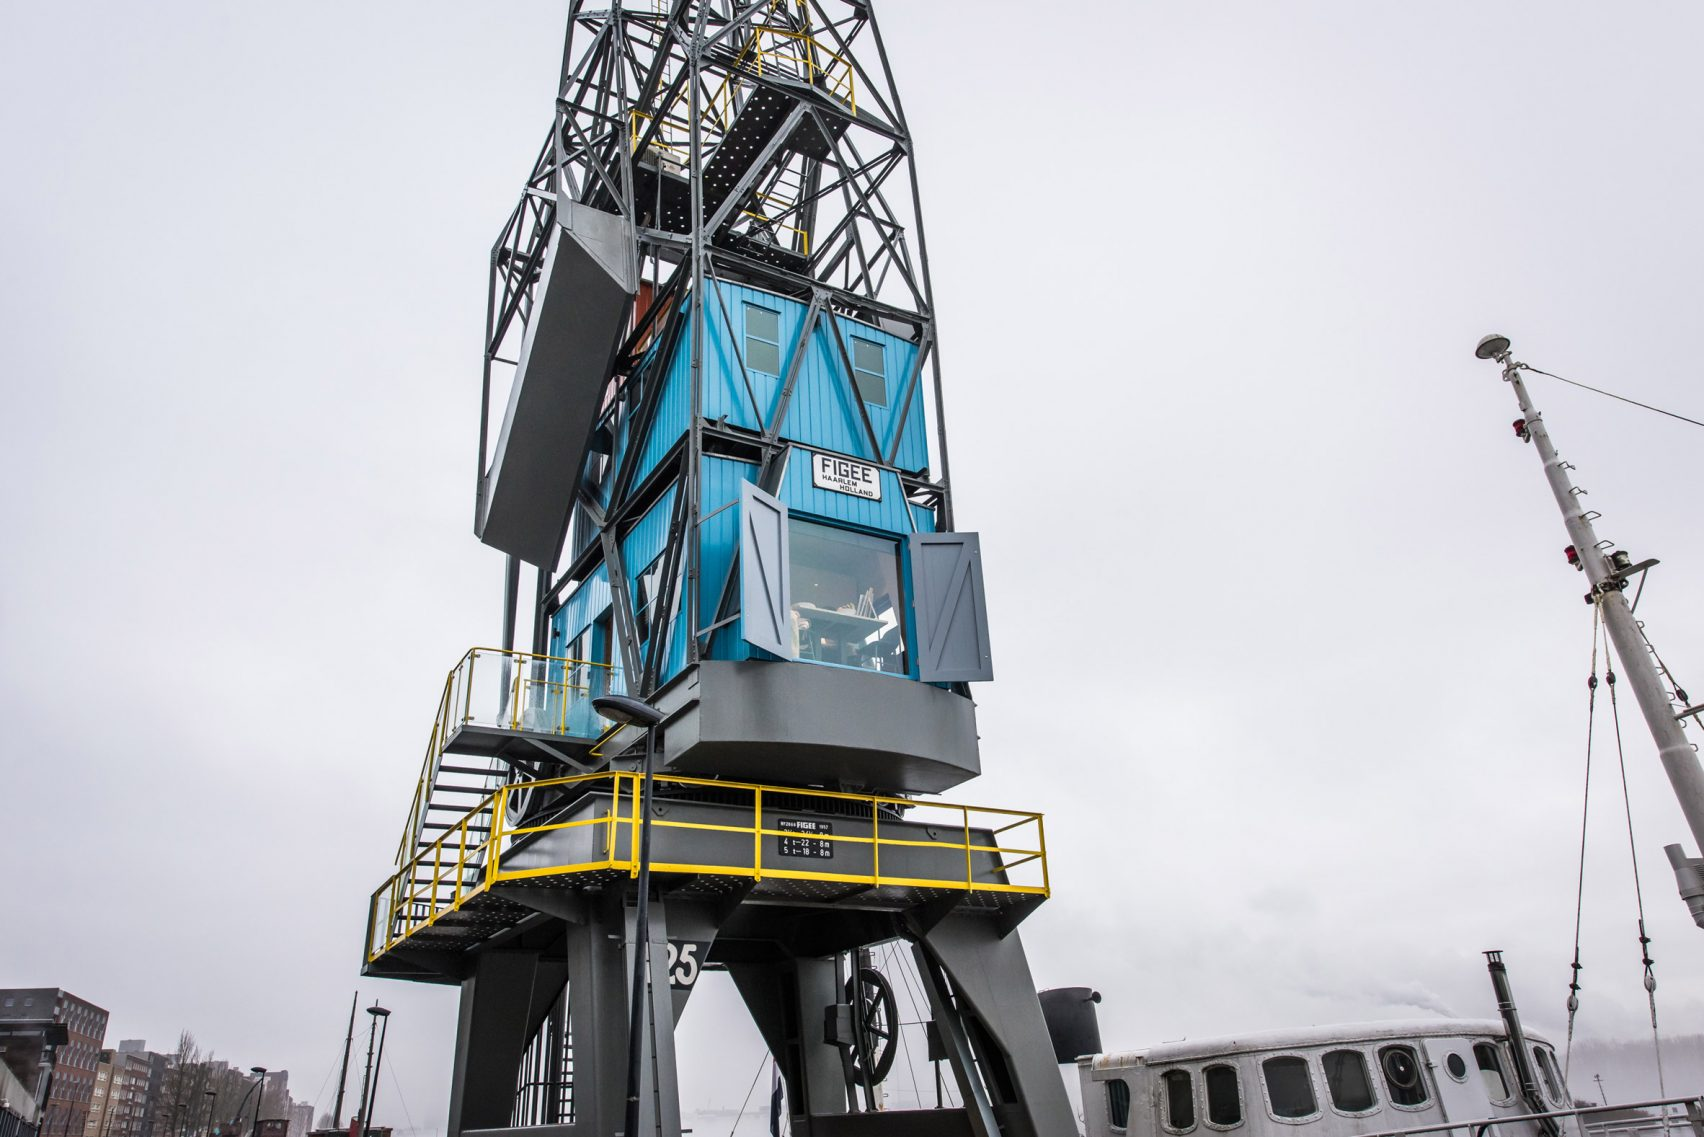 yays-crane-apartment-edward-van-vliet-architecture-interiors-netherlands_dezeen_2364_col_8-1704x1137